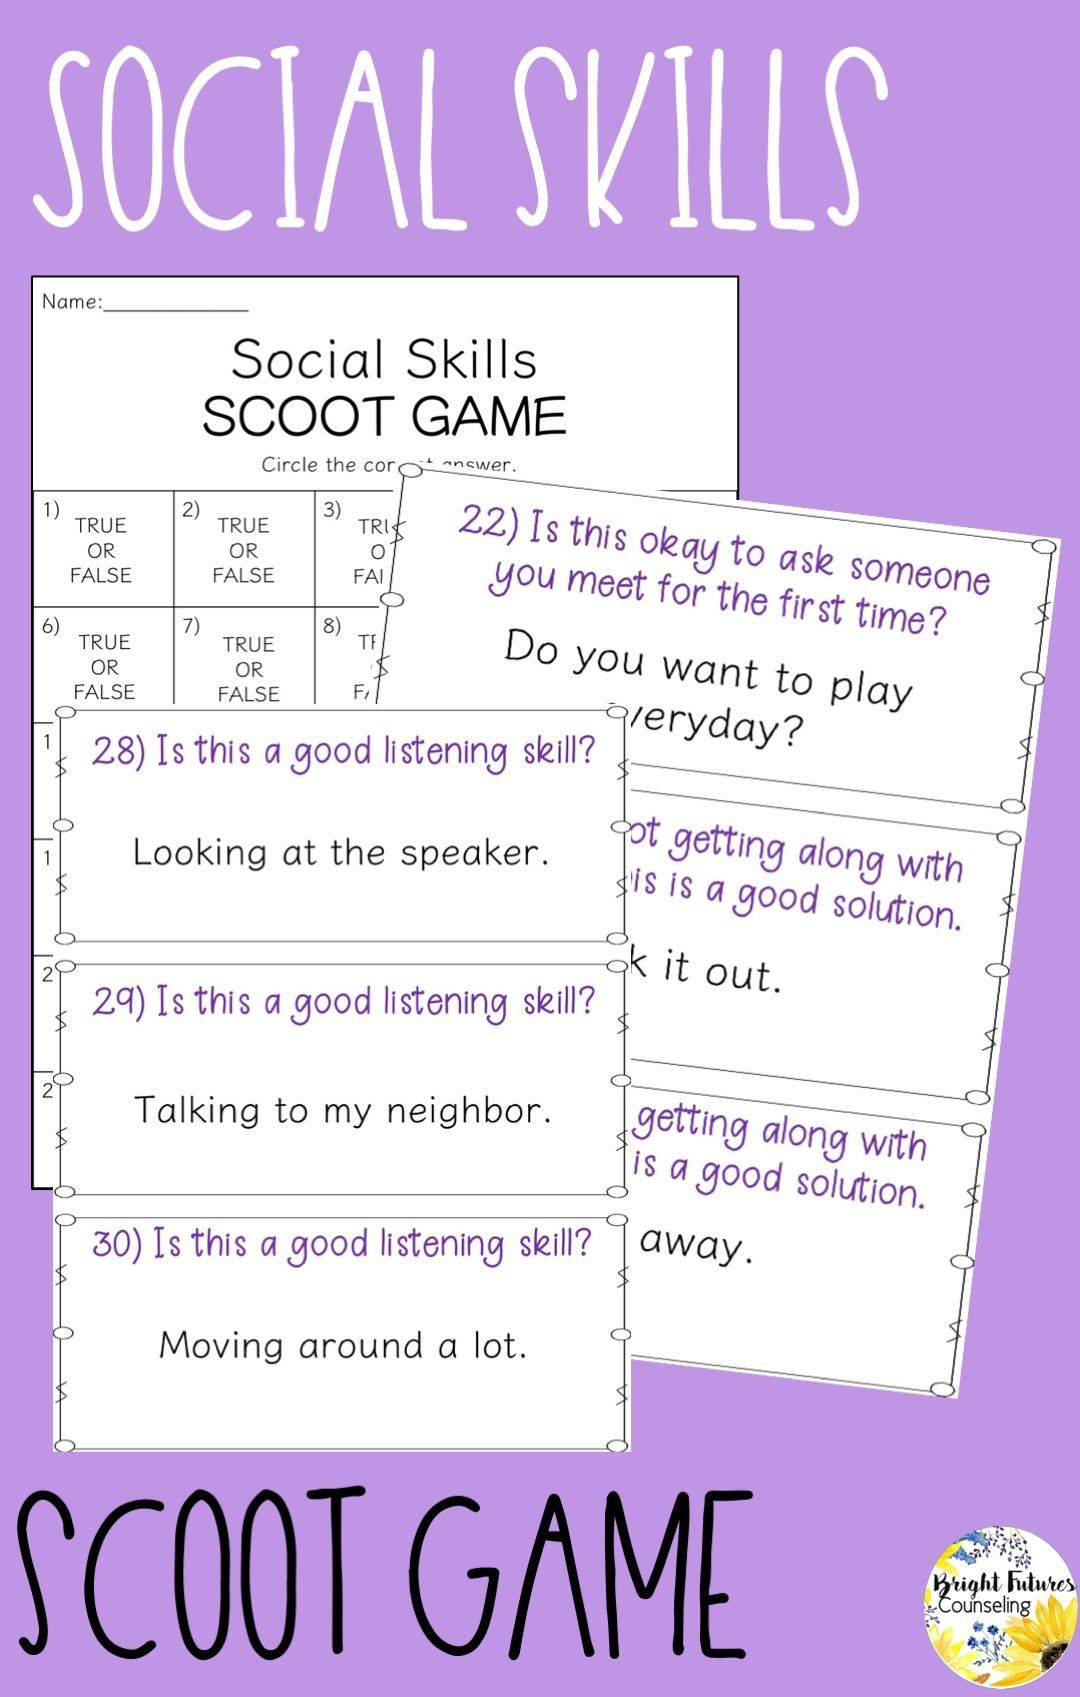 Social Skills Scoot Game Interactive Social Skills Game